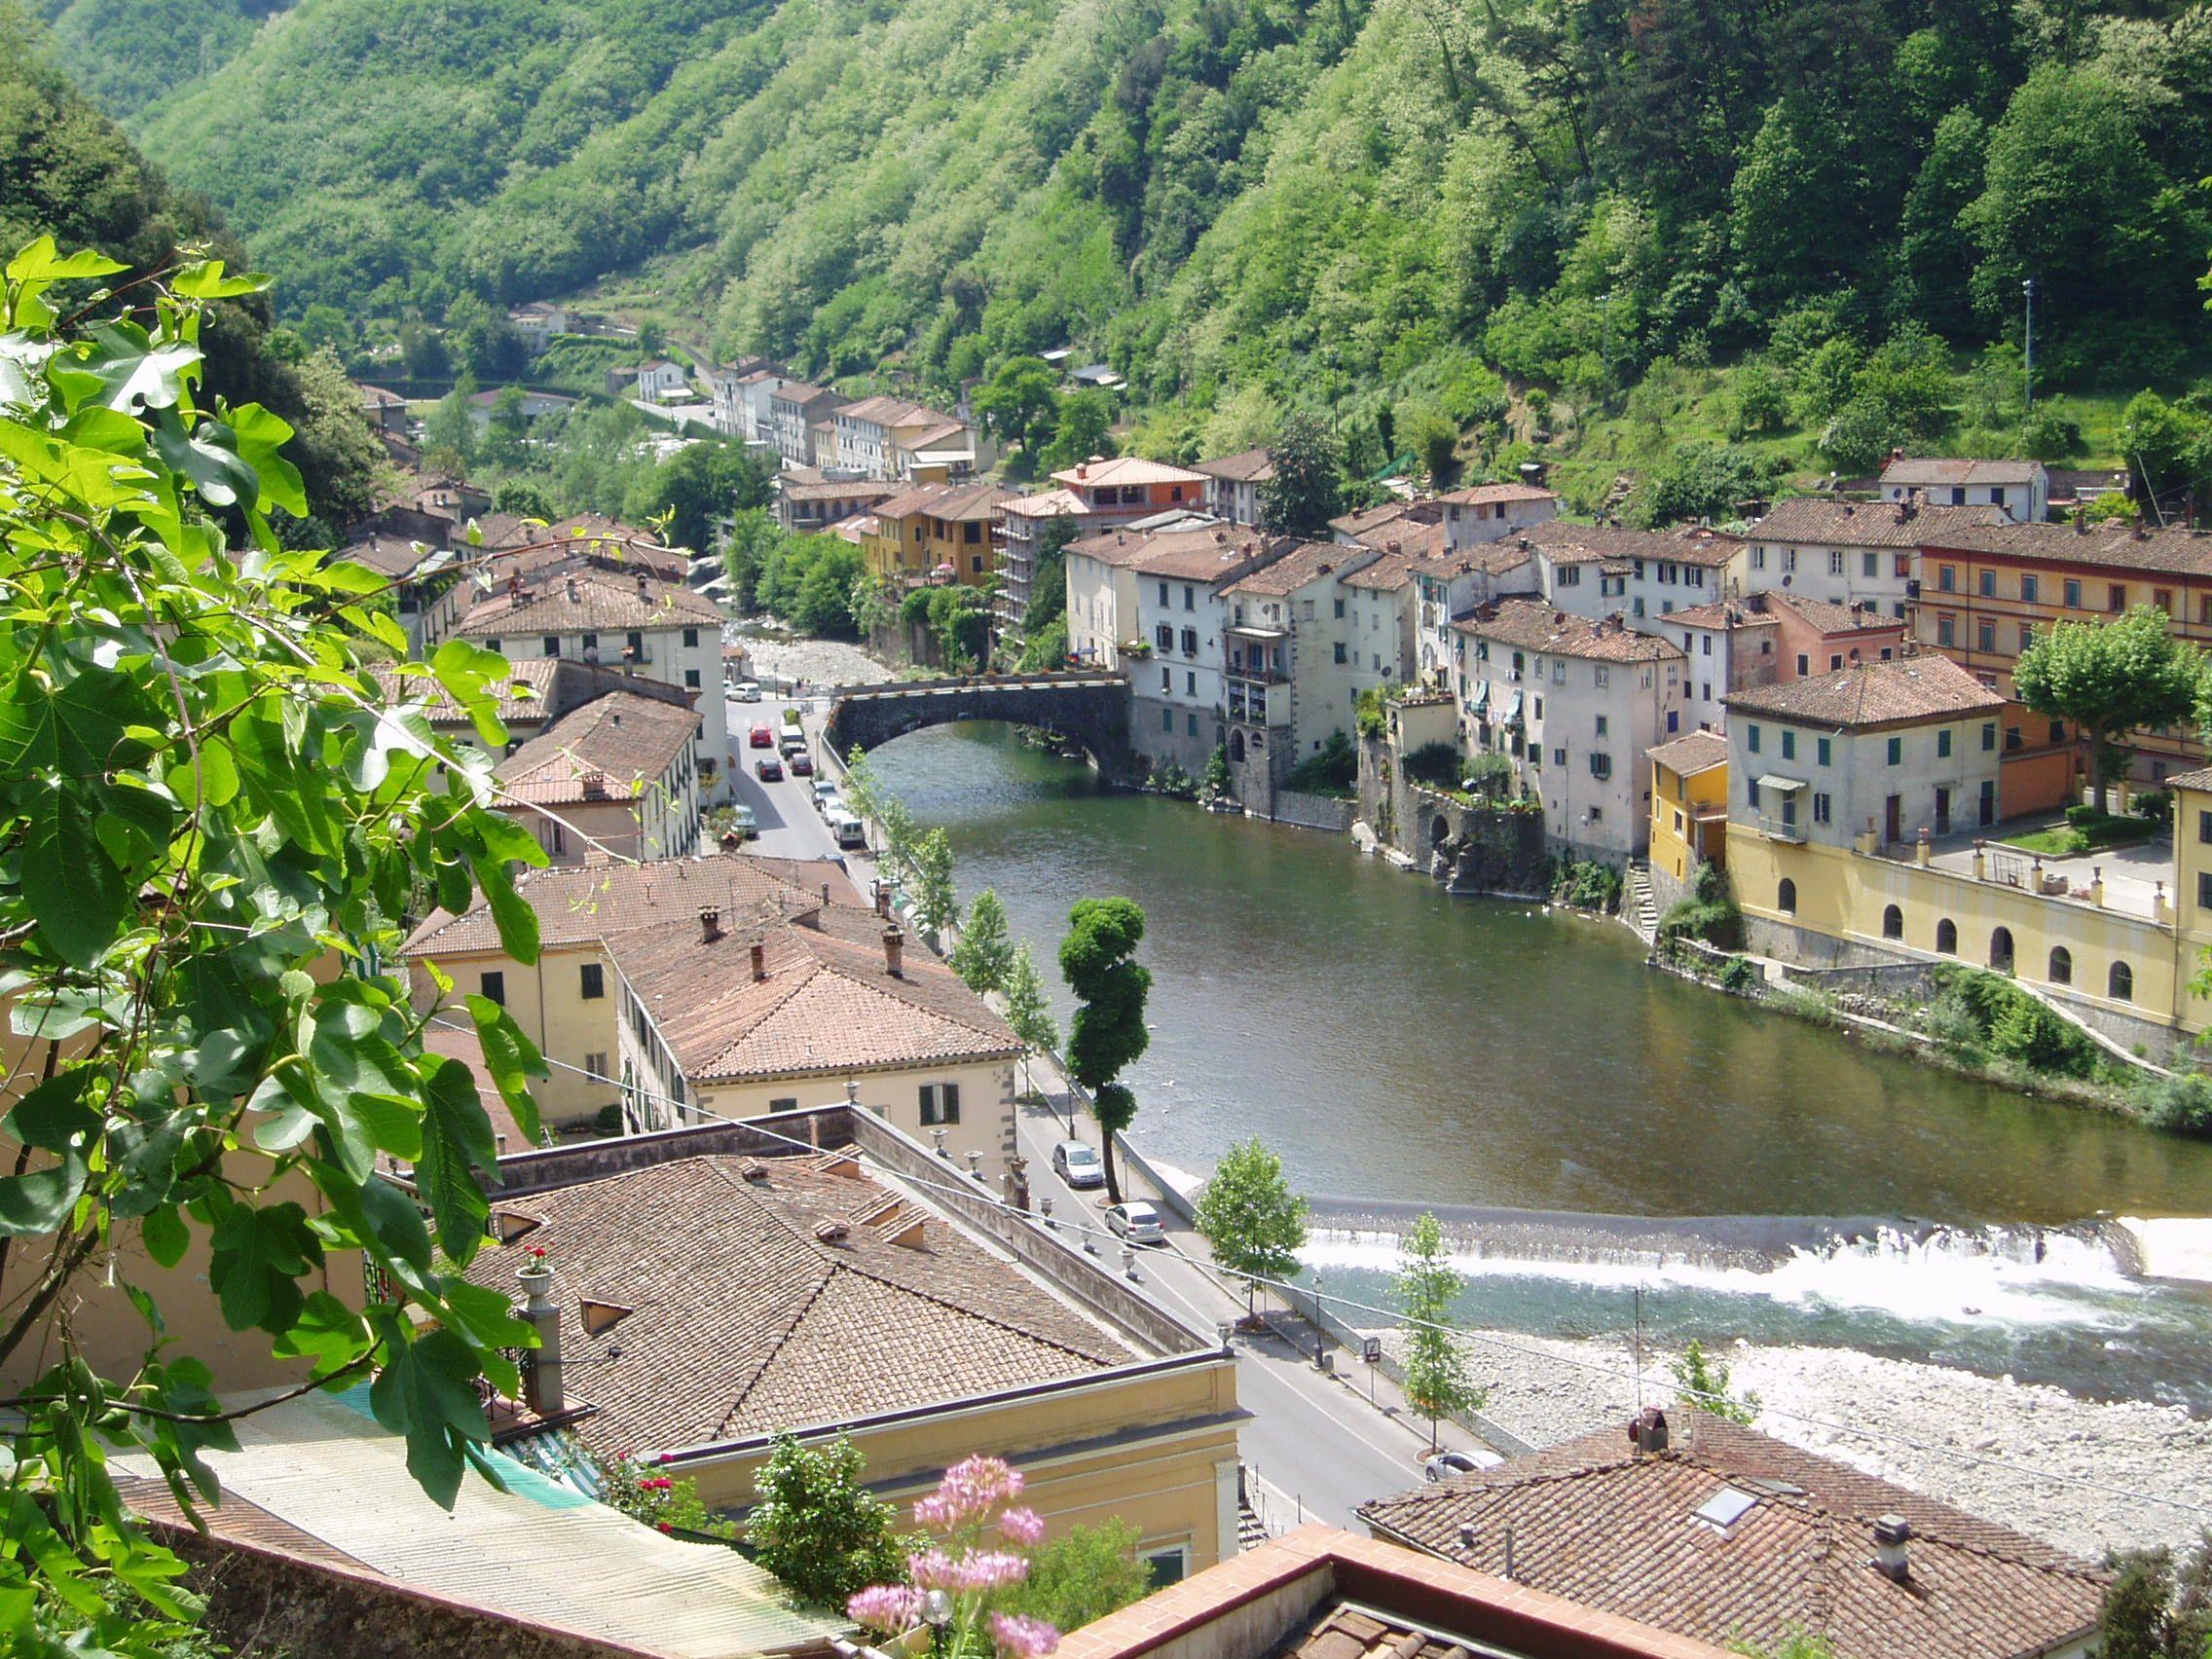 Bagni di Lucca - Granaiola | Yet here I am... | Pinterest | Lucca ...